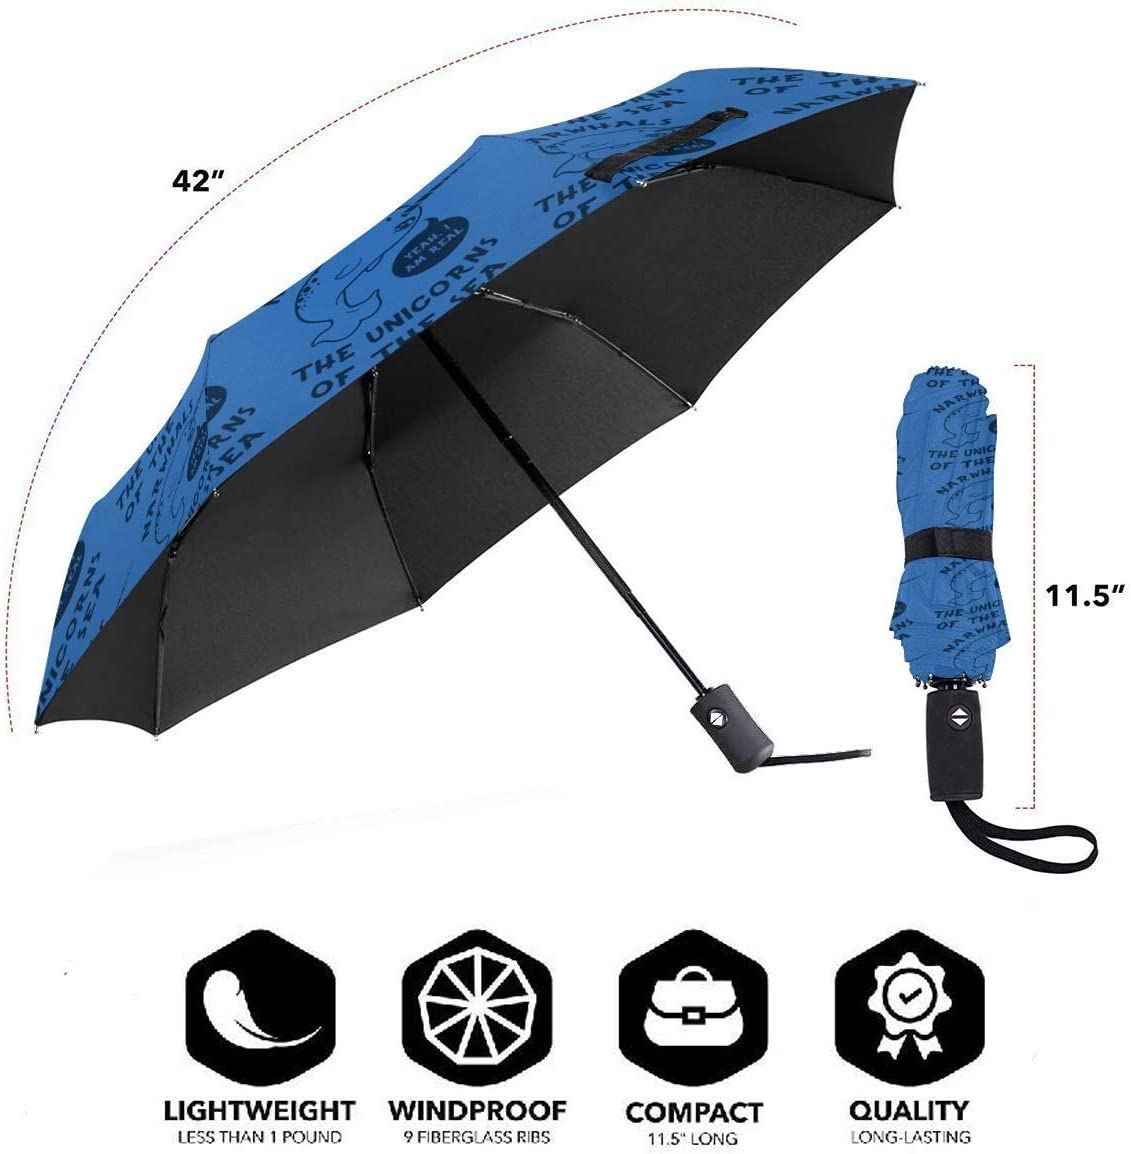 Narwhals Yes Im Real Unicorn Of The Sea Automatic Tri-fold Umbrella Folding Rain Umbrell Sunshade